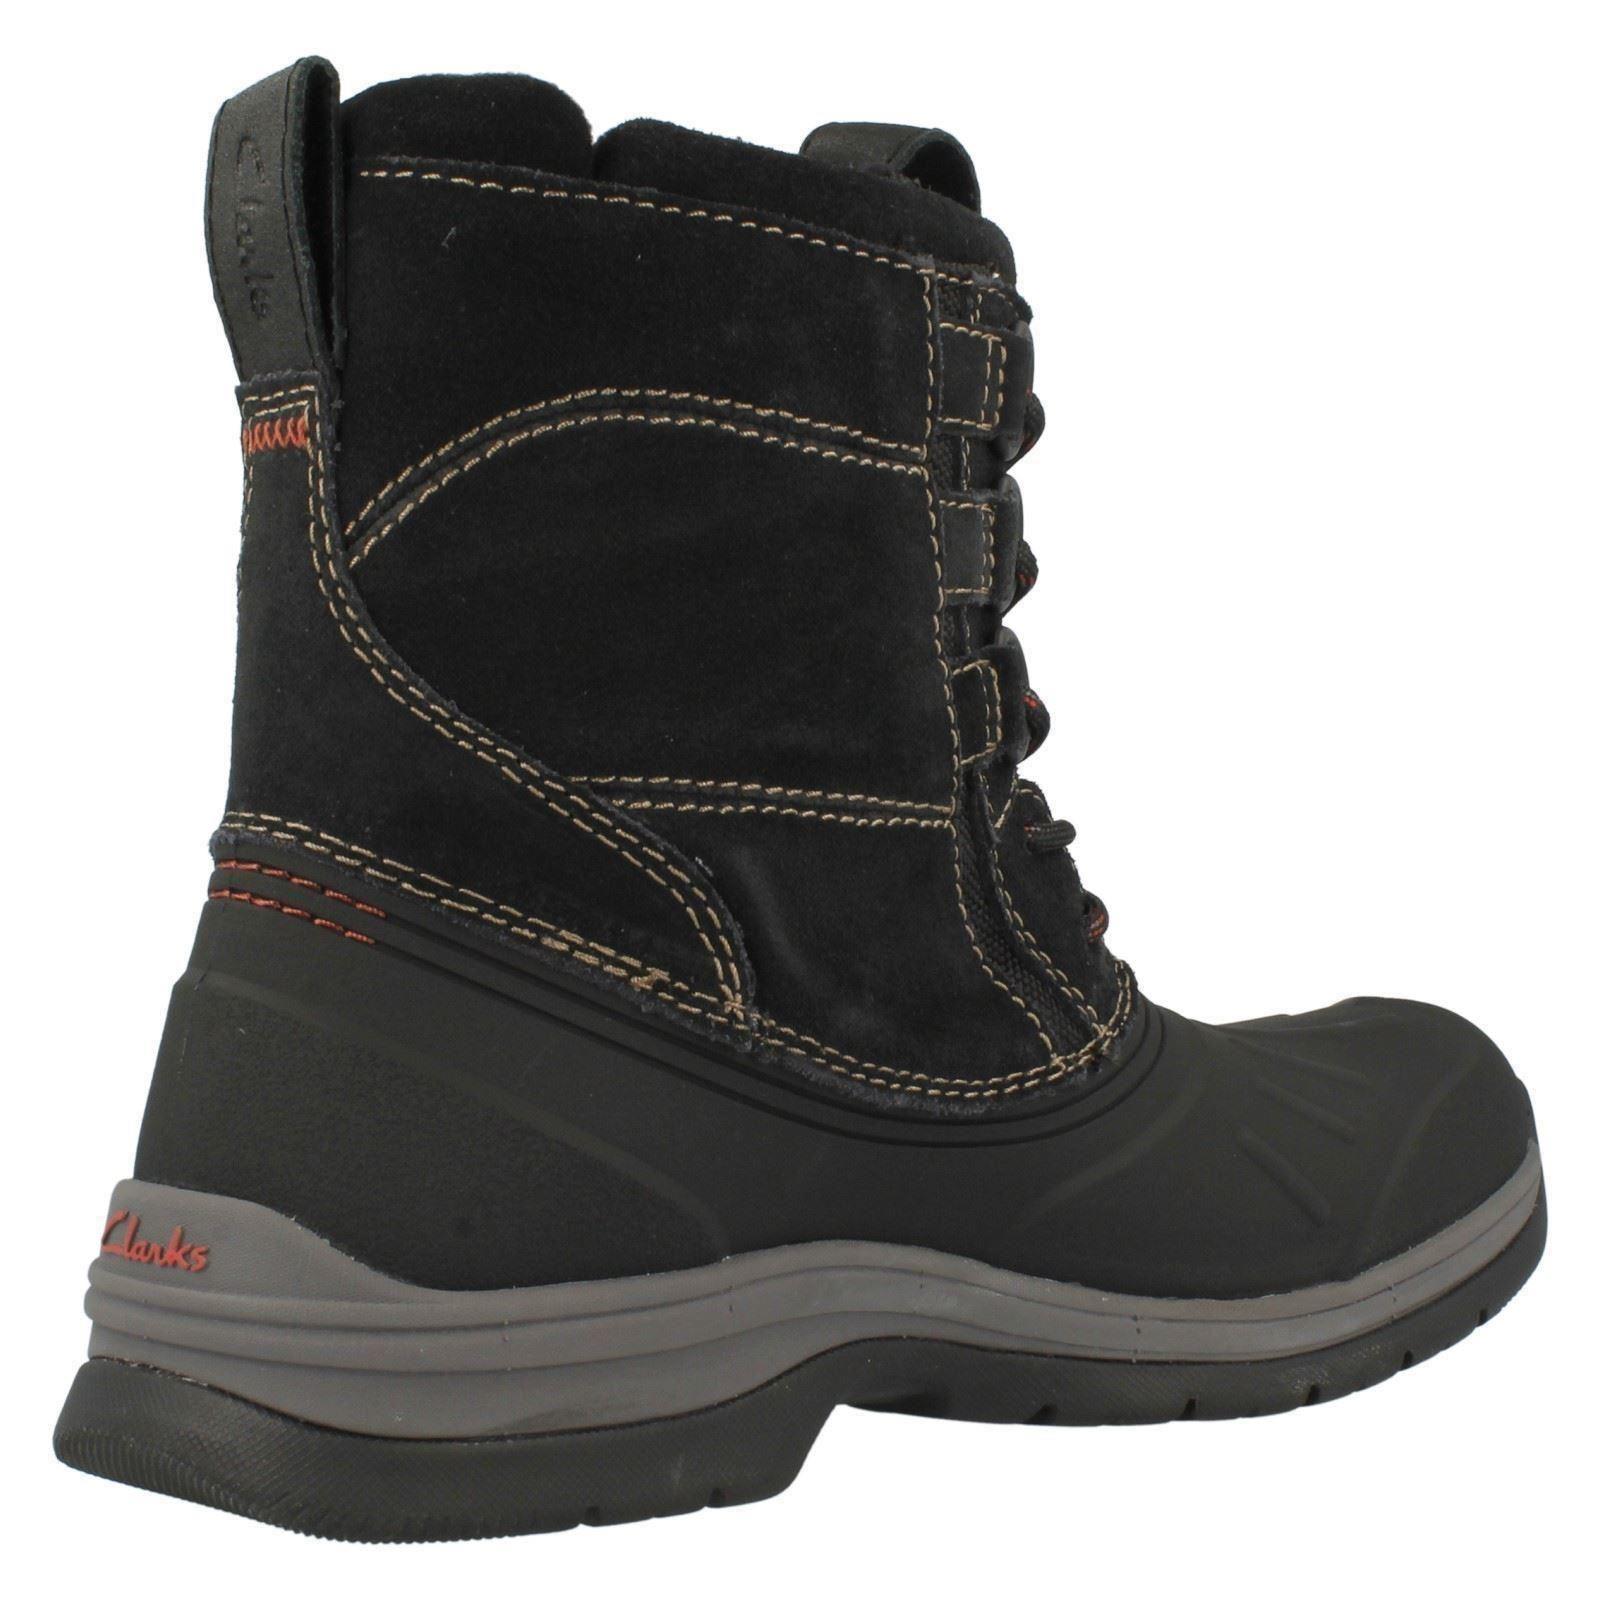 Mens-Clarks-Outdoor-Boots-Nashoba-Summit thumbnail 6